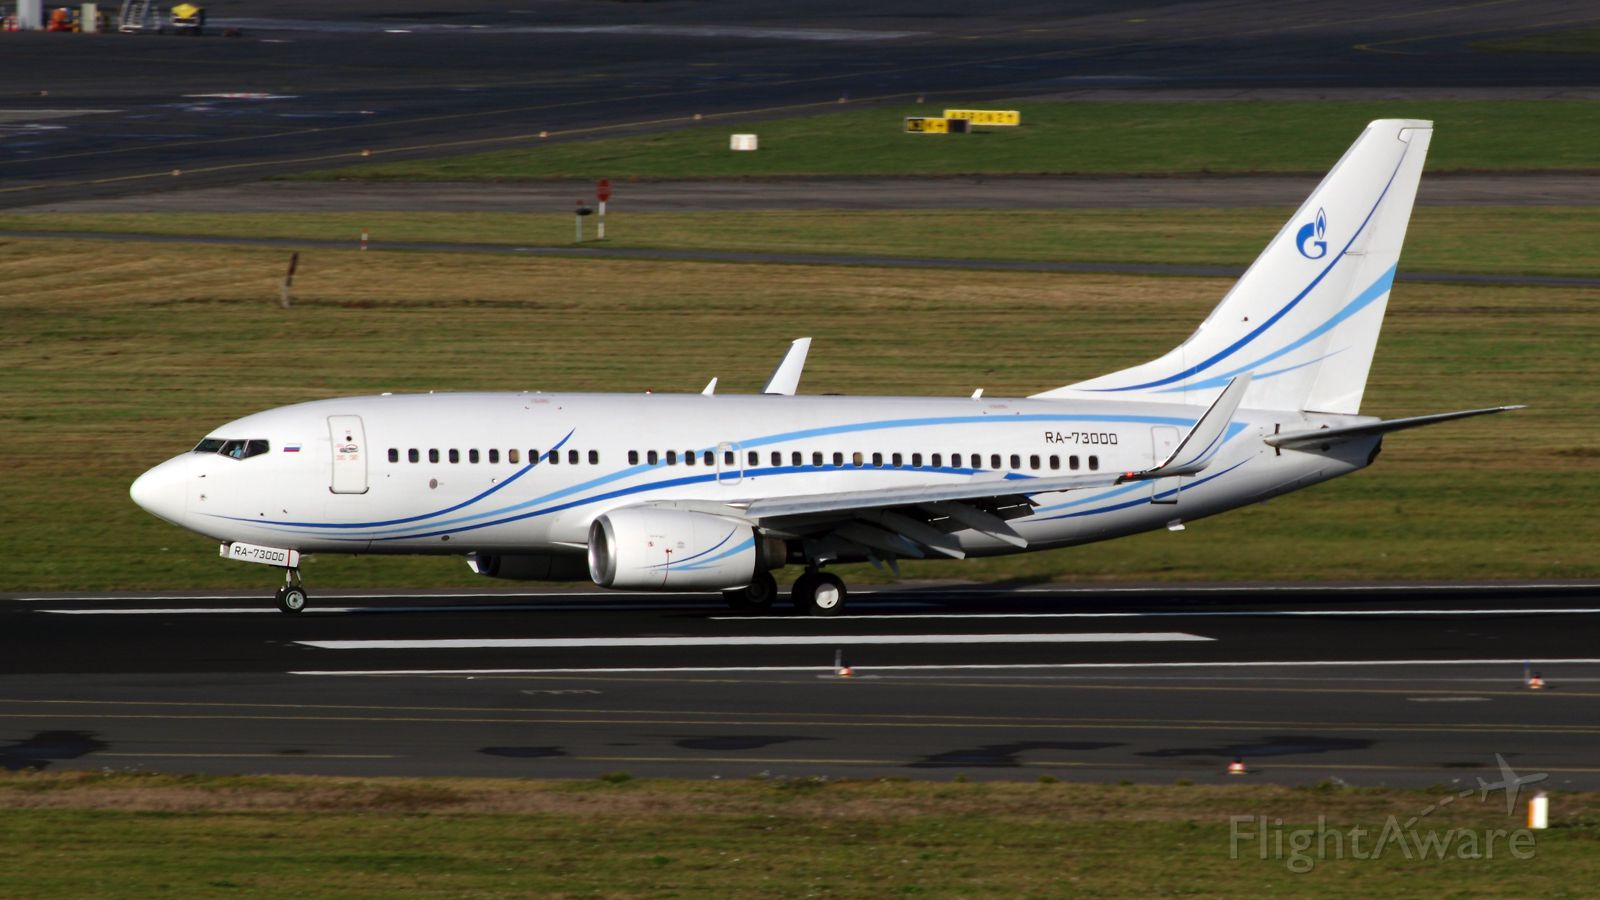 Boeing 737-700 (RA-73000)